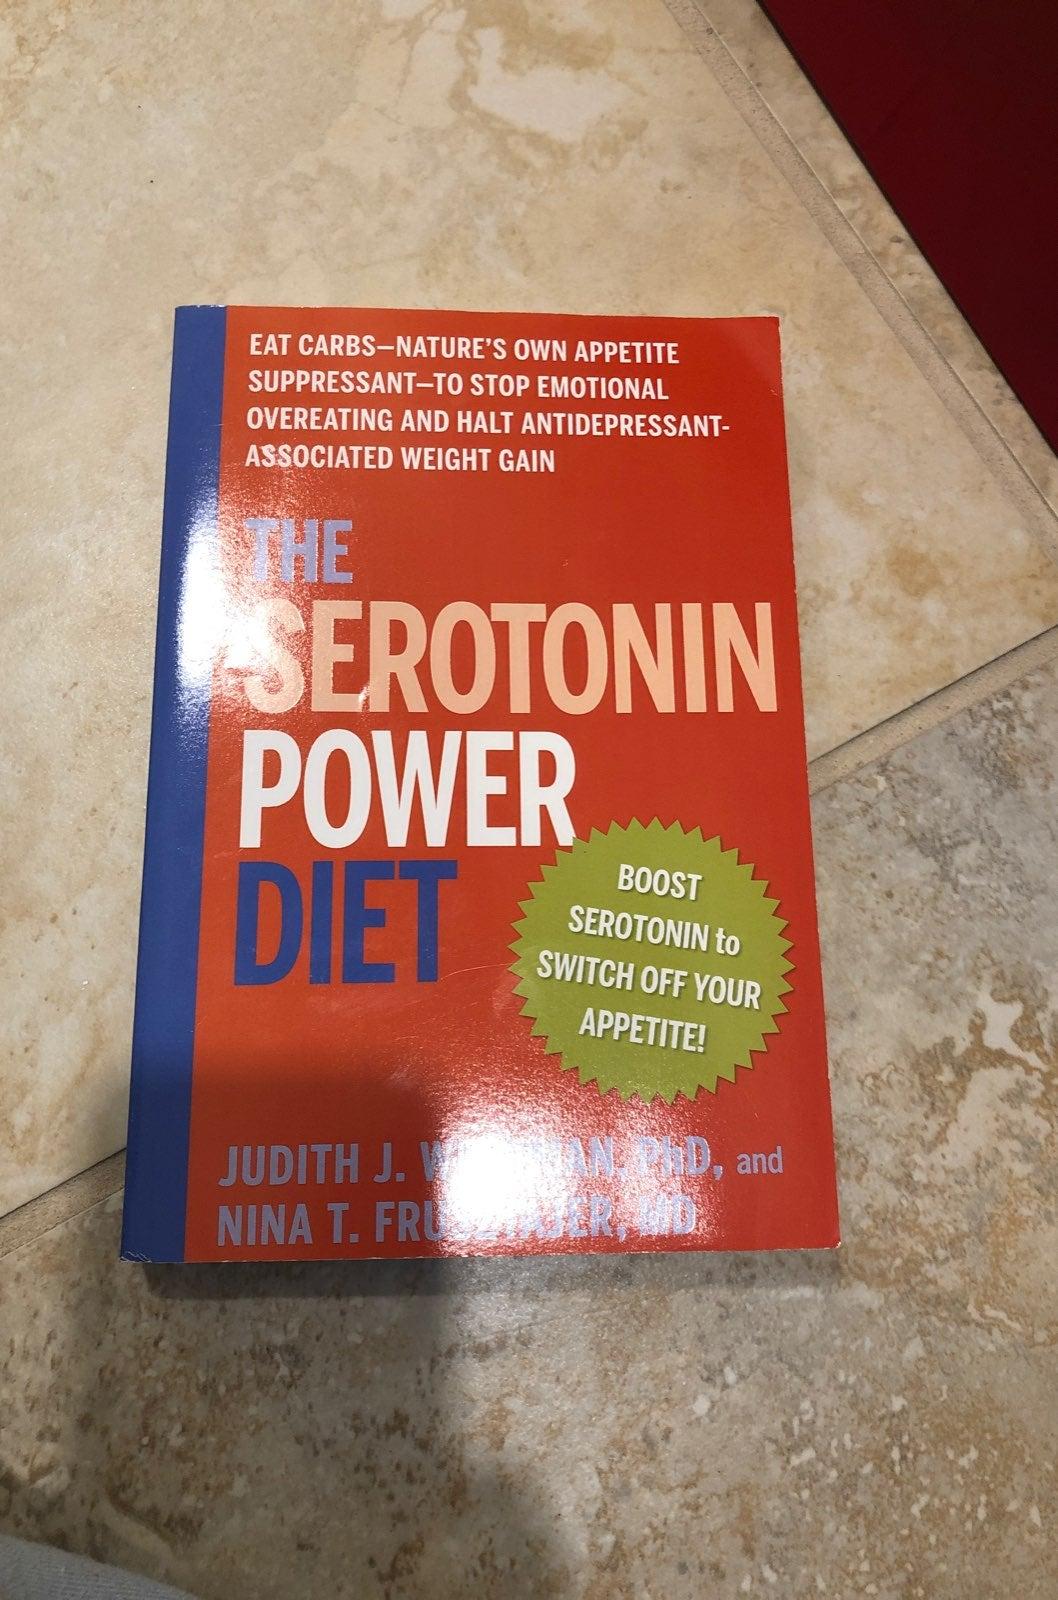 The serotonin power diet book